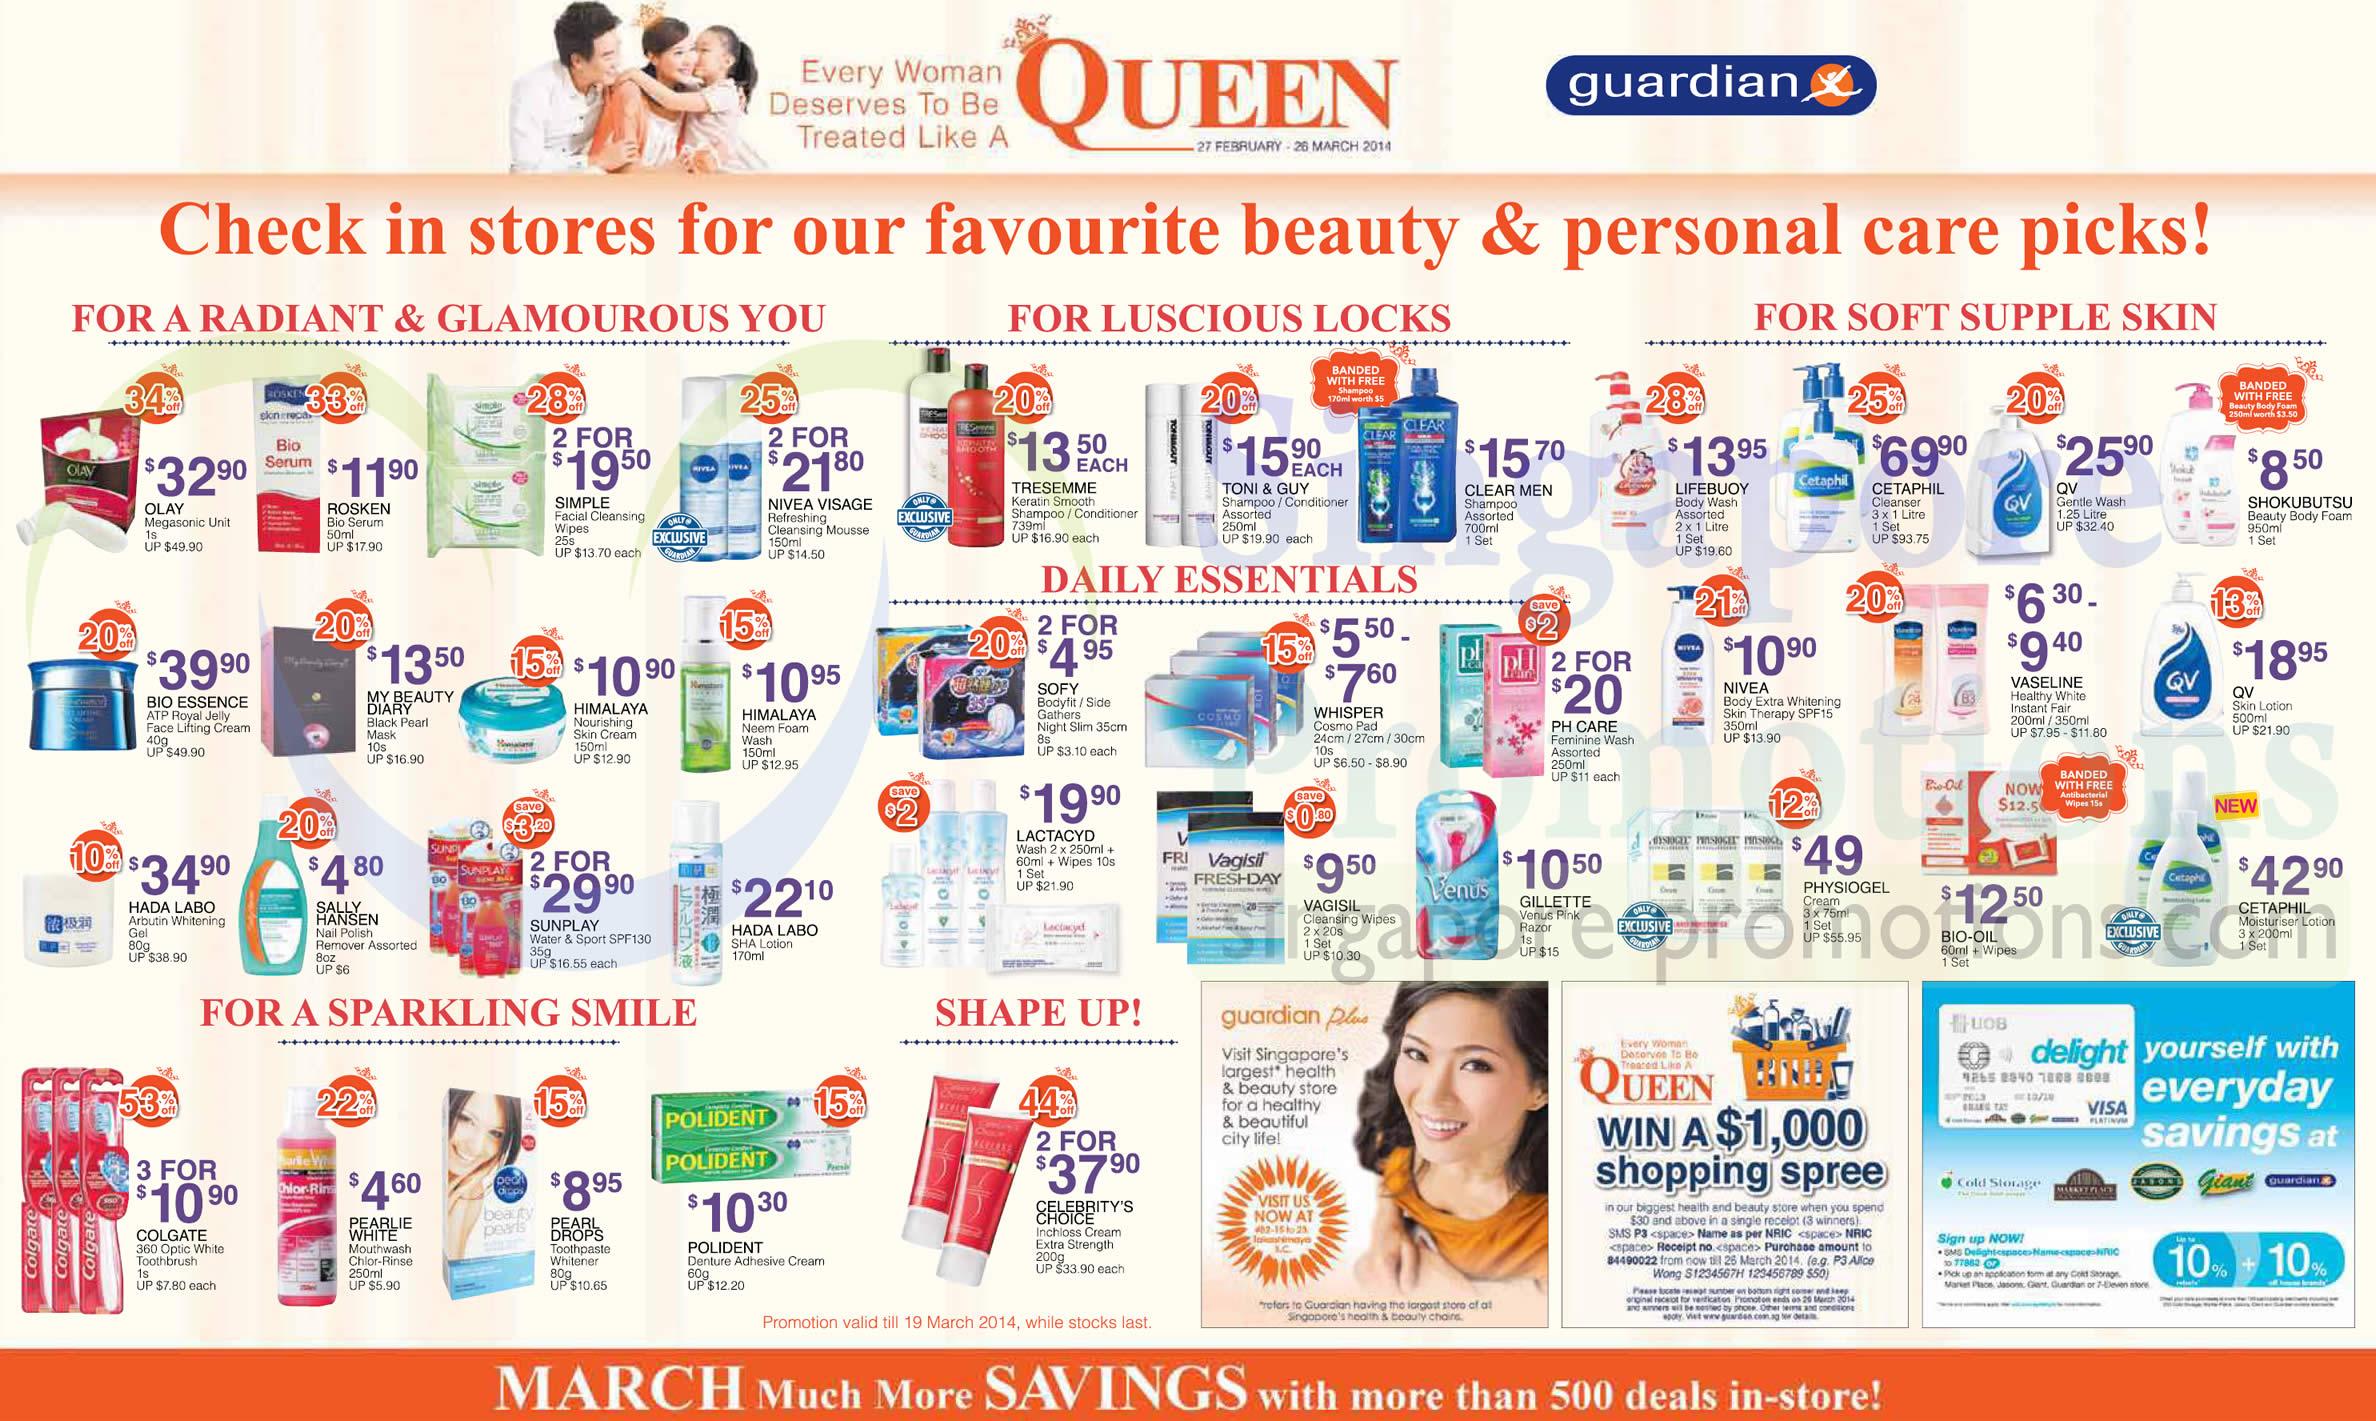 Beauty, Cosmetics, Personal Care, Bio-Essence, Hada Labo, Sunplay, Olay, Celebritys Choice, Cetaphil, Physiogel